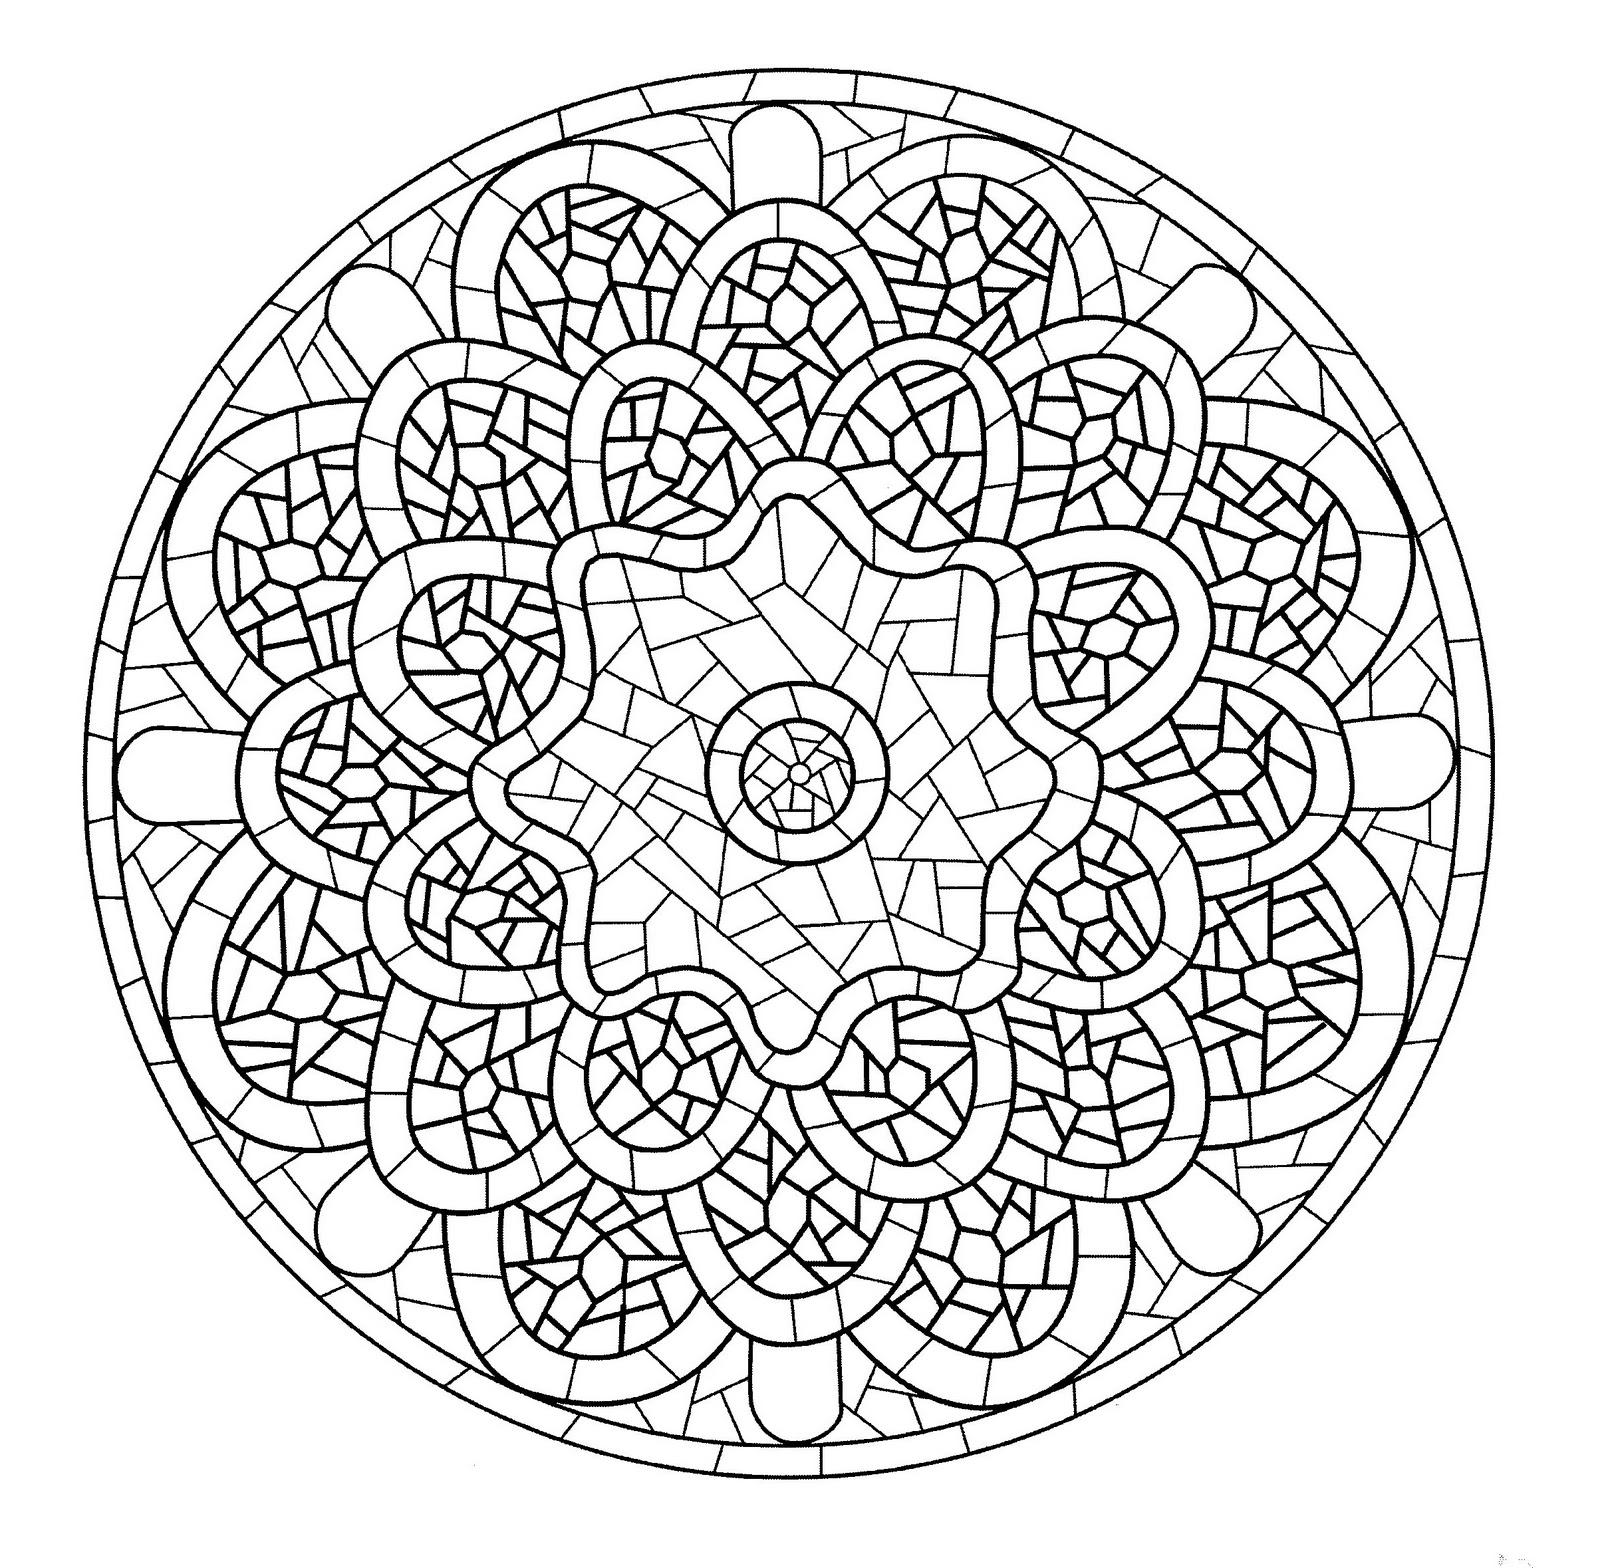 mandala a colorier gratuit a imprimer 7 mandalas de difficult normale 100 mandalas zen. Black Bedroom Furniture Sets. Home Design Ideas